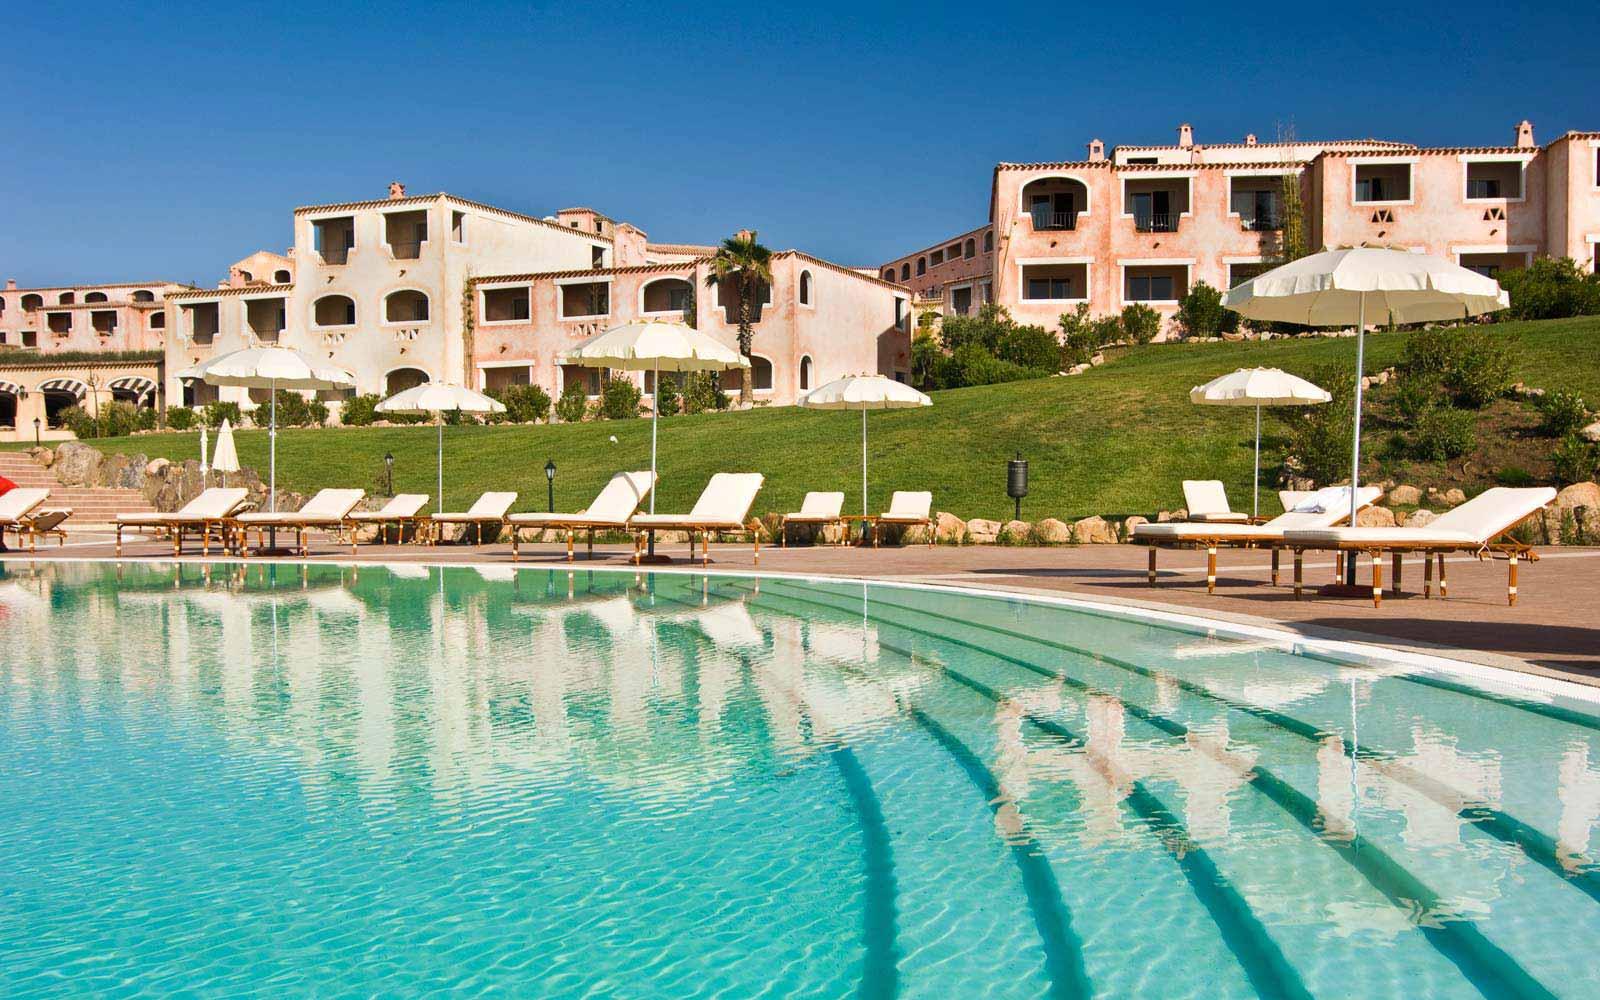 Colonna Resort pool view